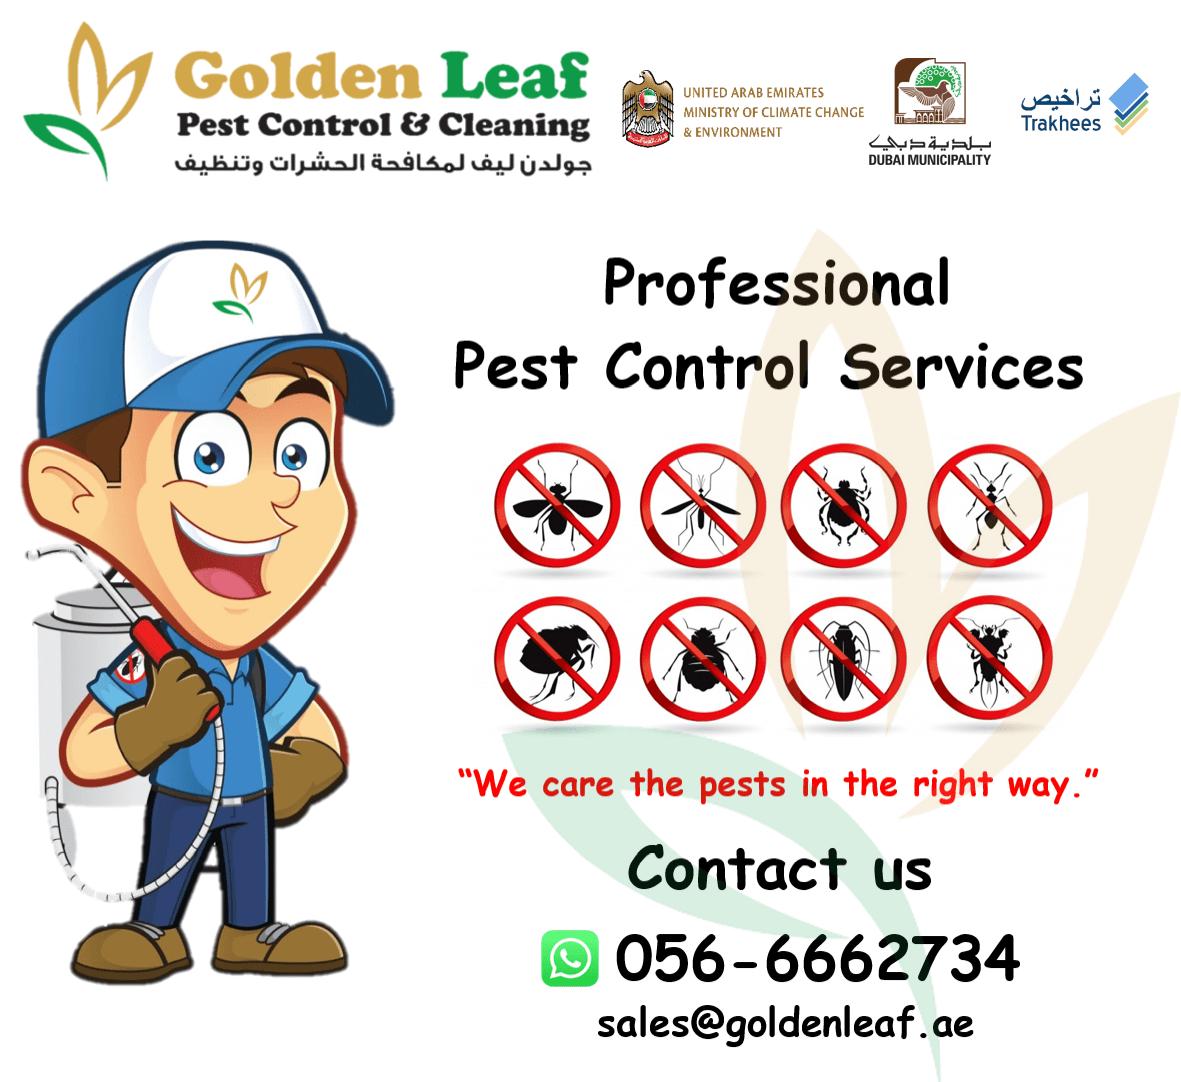 Golden Leaf Pest Control & Cleaning 7